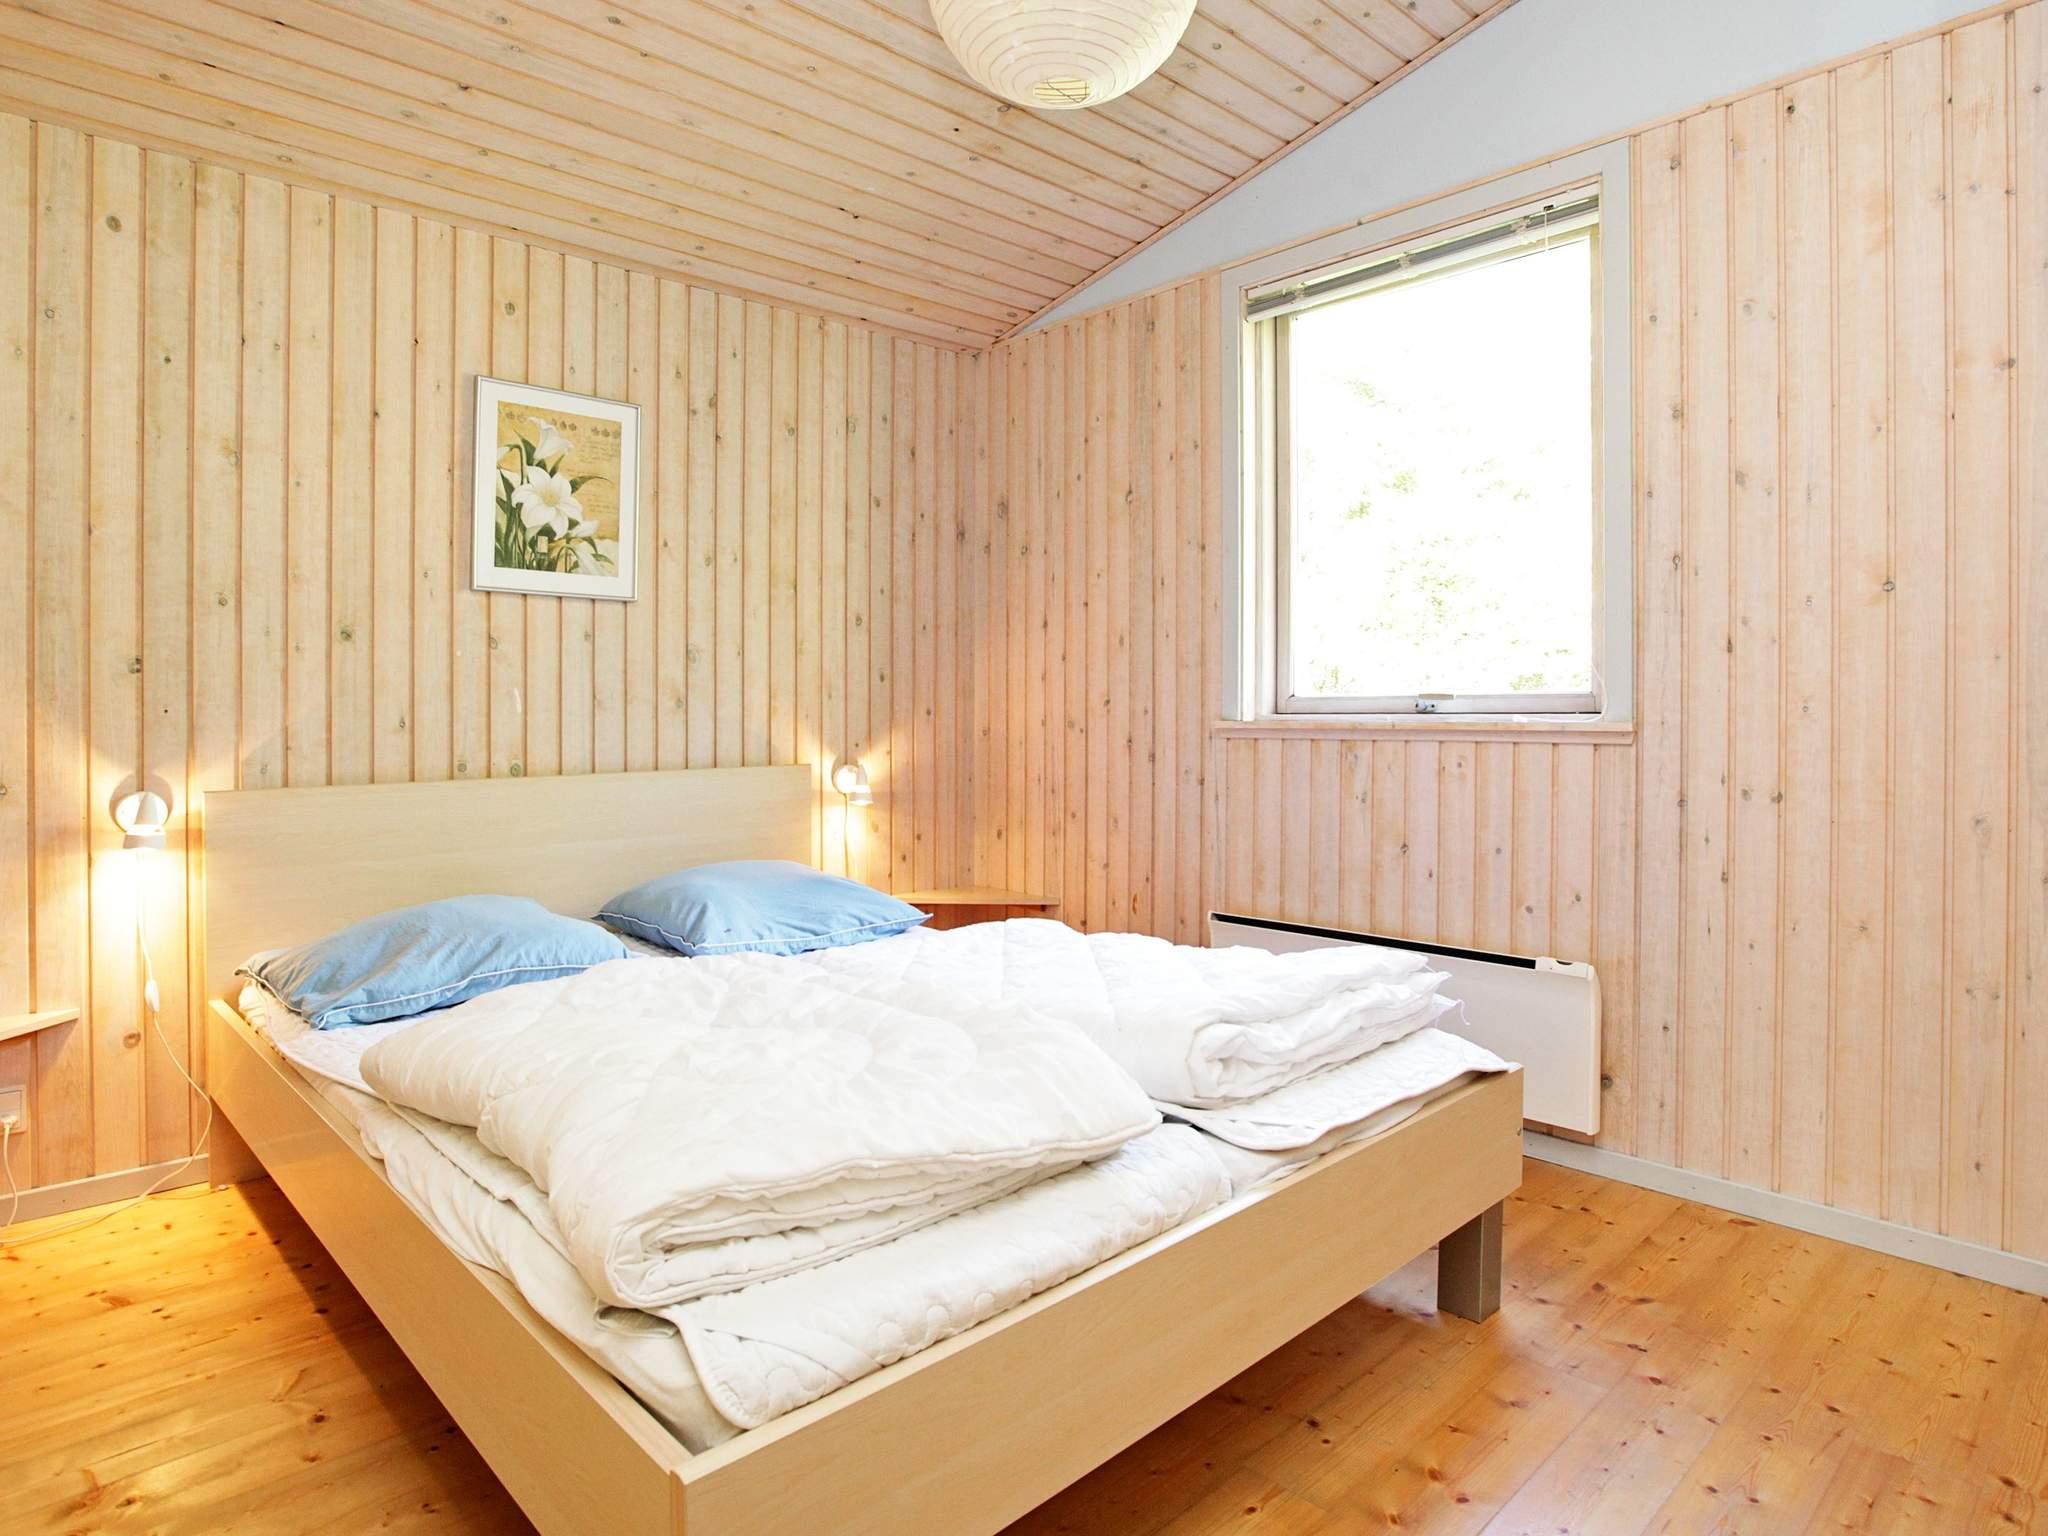 Ferienhaus Overby Lyng (93505), Nykøbing Sj, , Westseeland, Dänemark, Bild 16